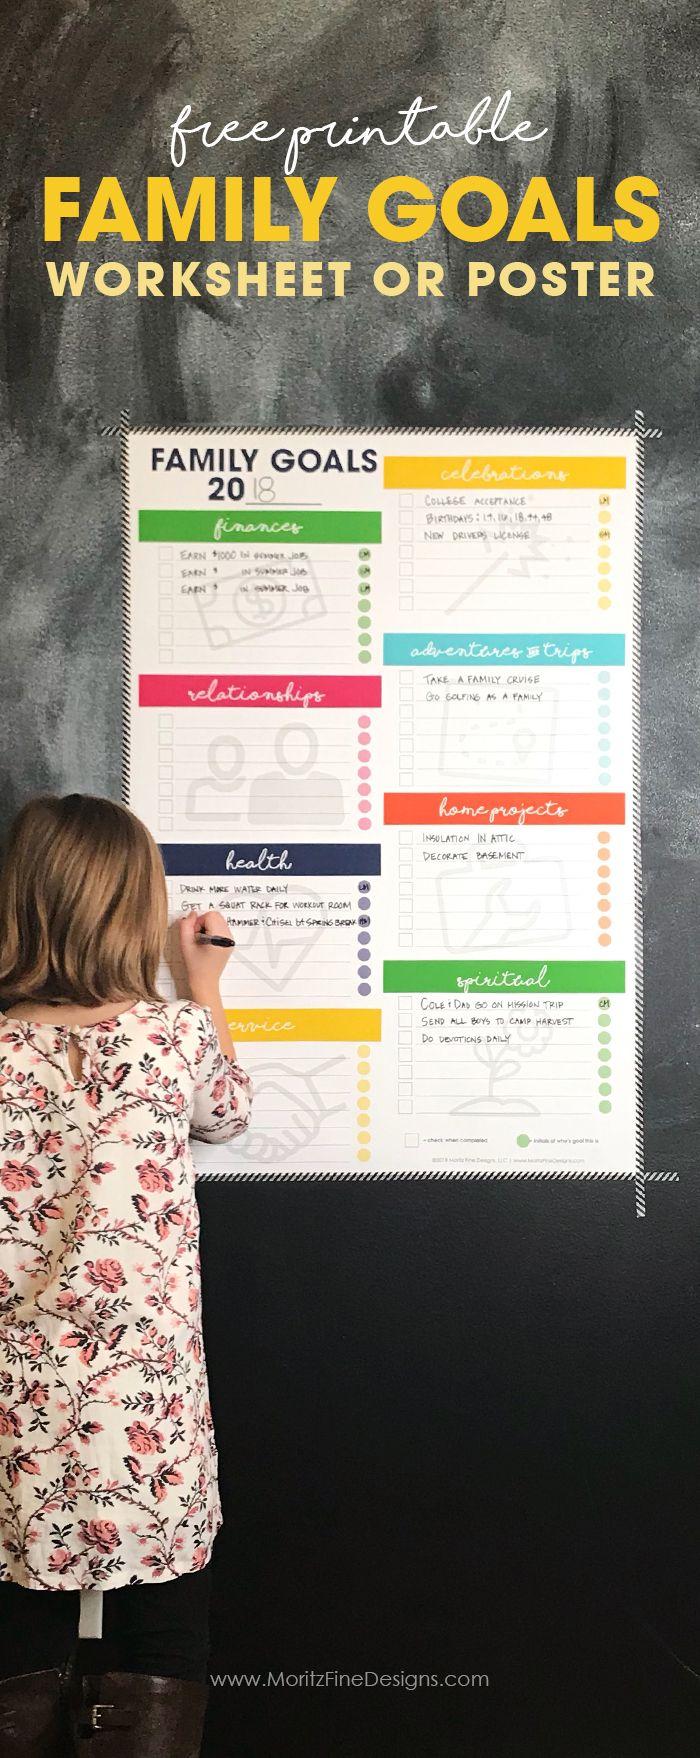 Family Goal Worksheet Free Printable Worksheet Or Poster Goals Worksheet Family Goals Free Goal Printables